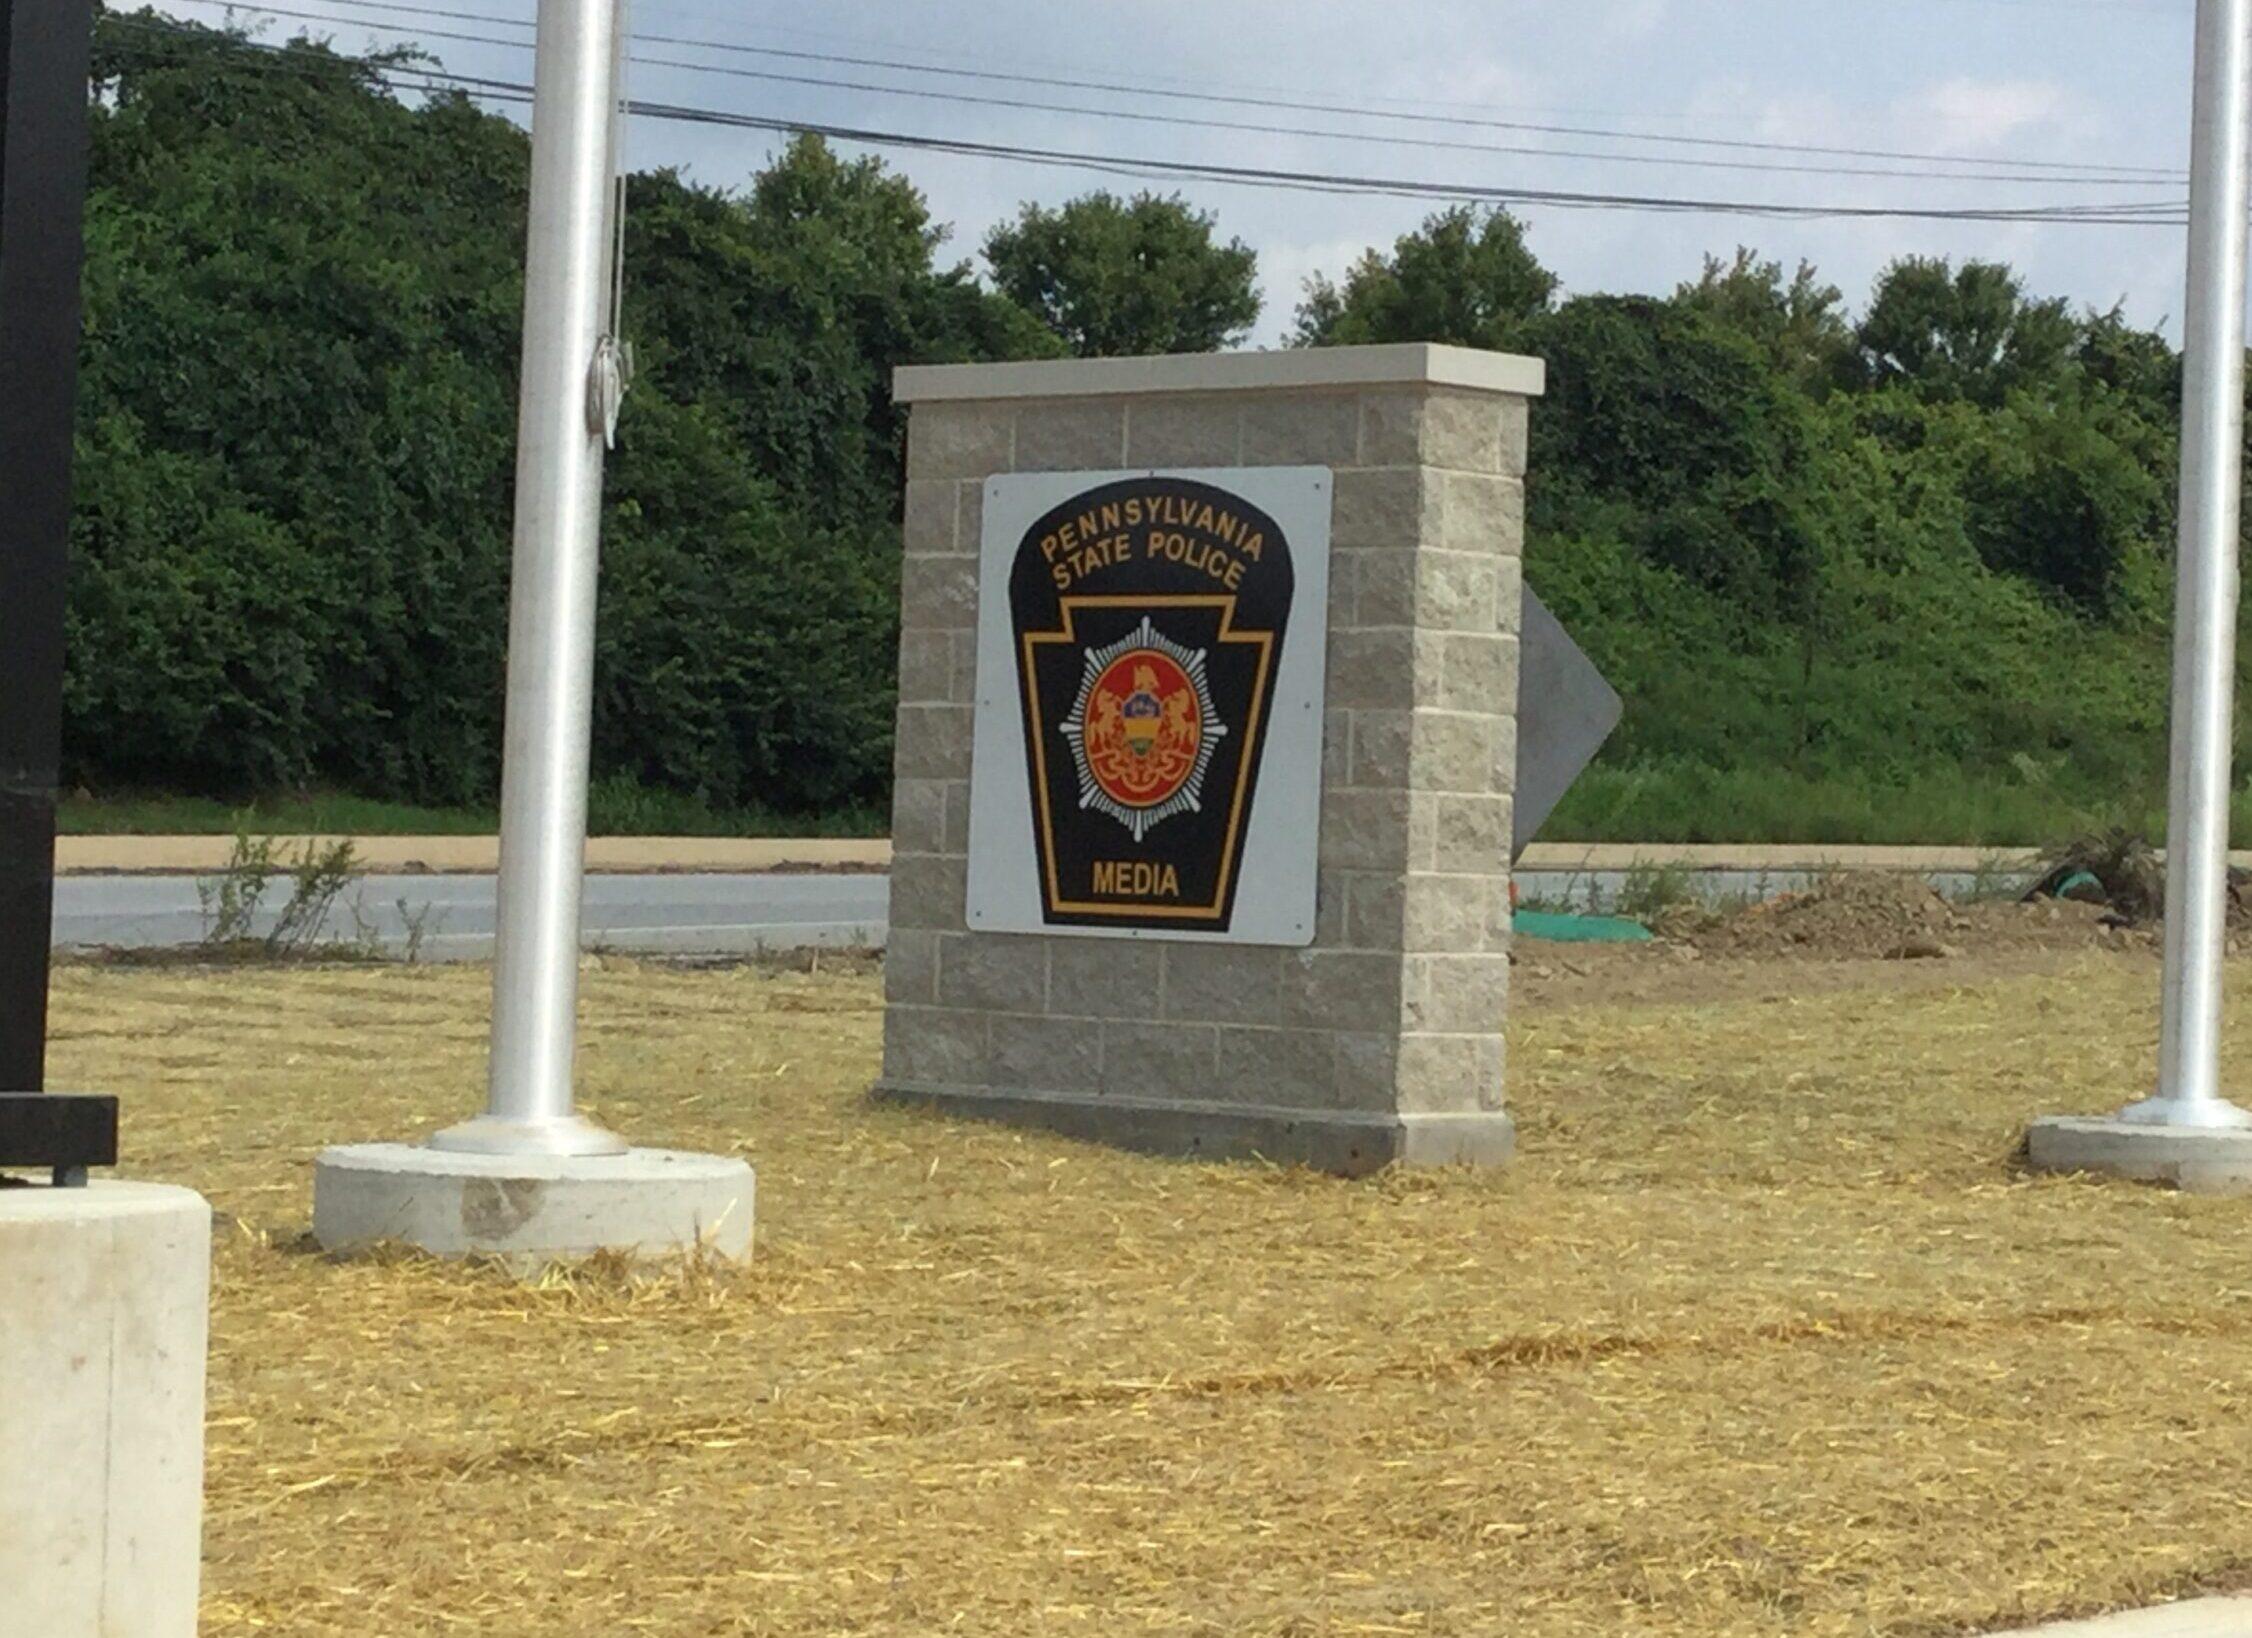 PA State Police Barracks – Media, PA